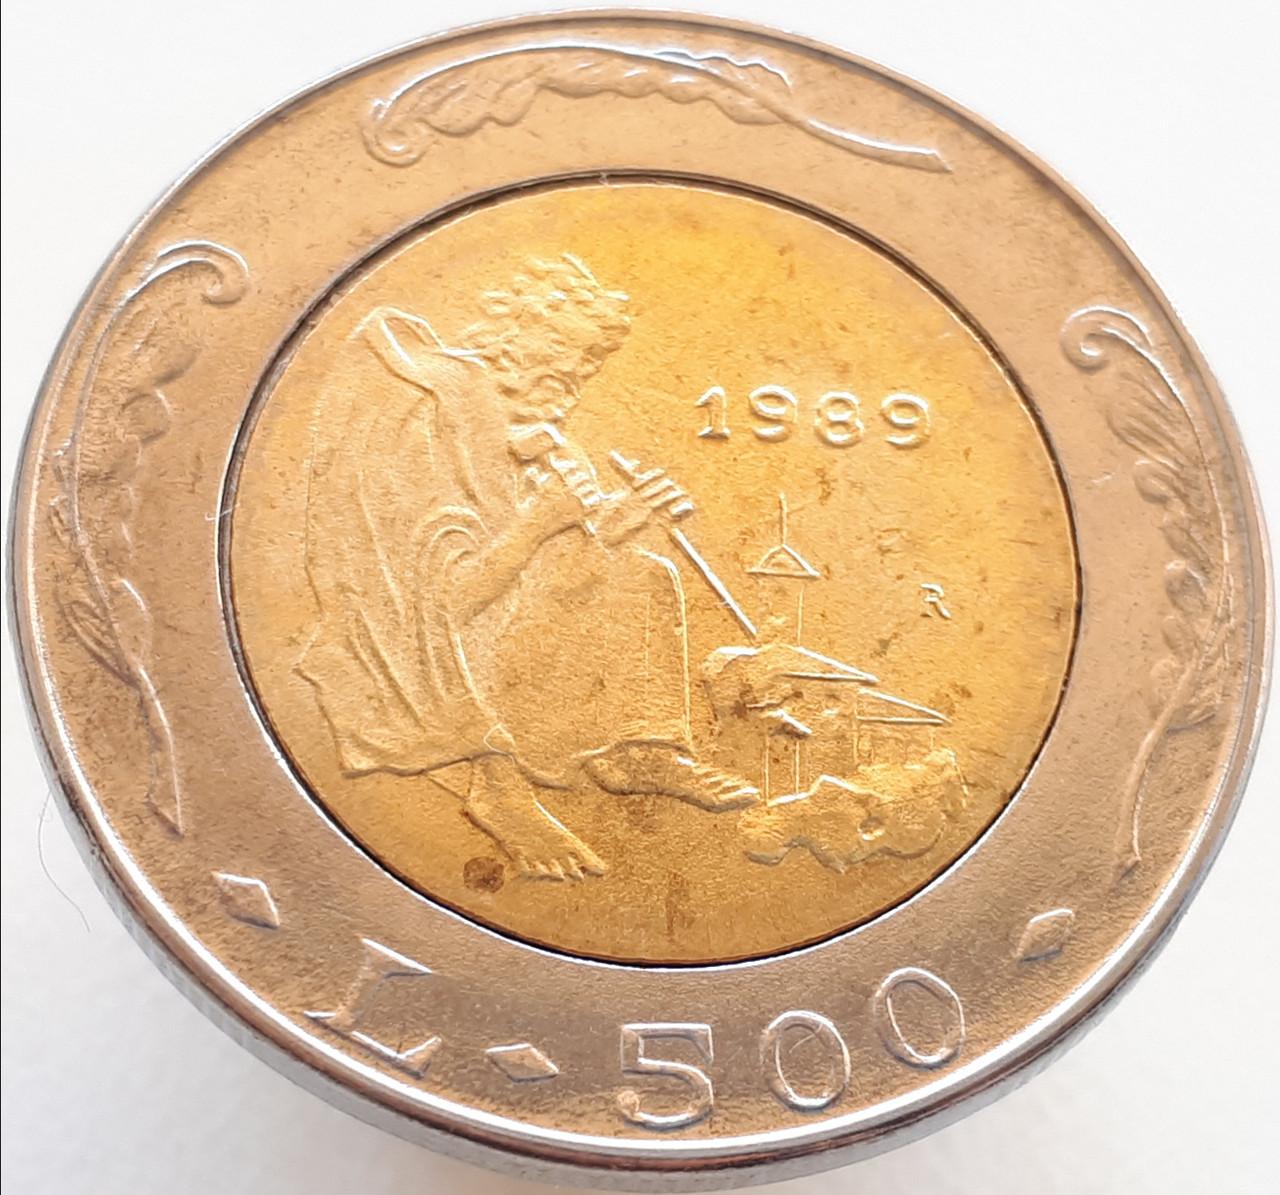 Сан-Марино 500 лир 1989